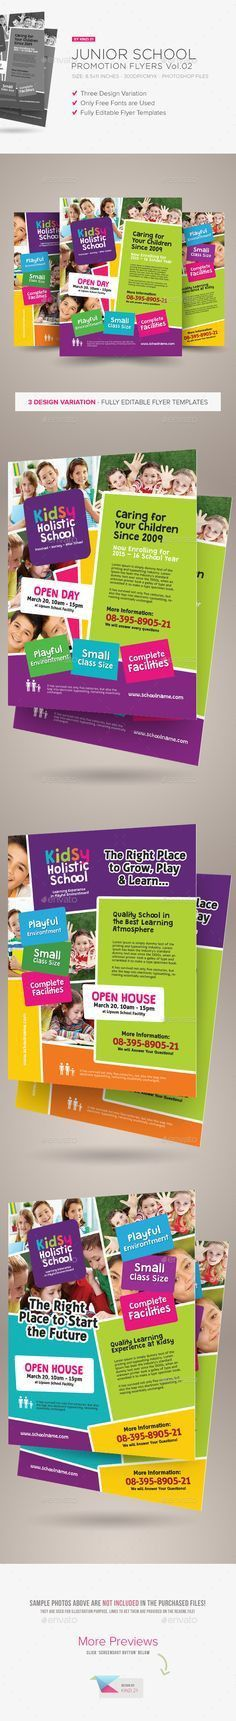 After School Program Flyer Templates | School programs, Flyer ...